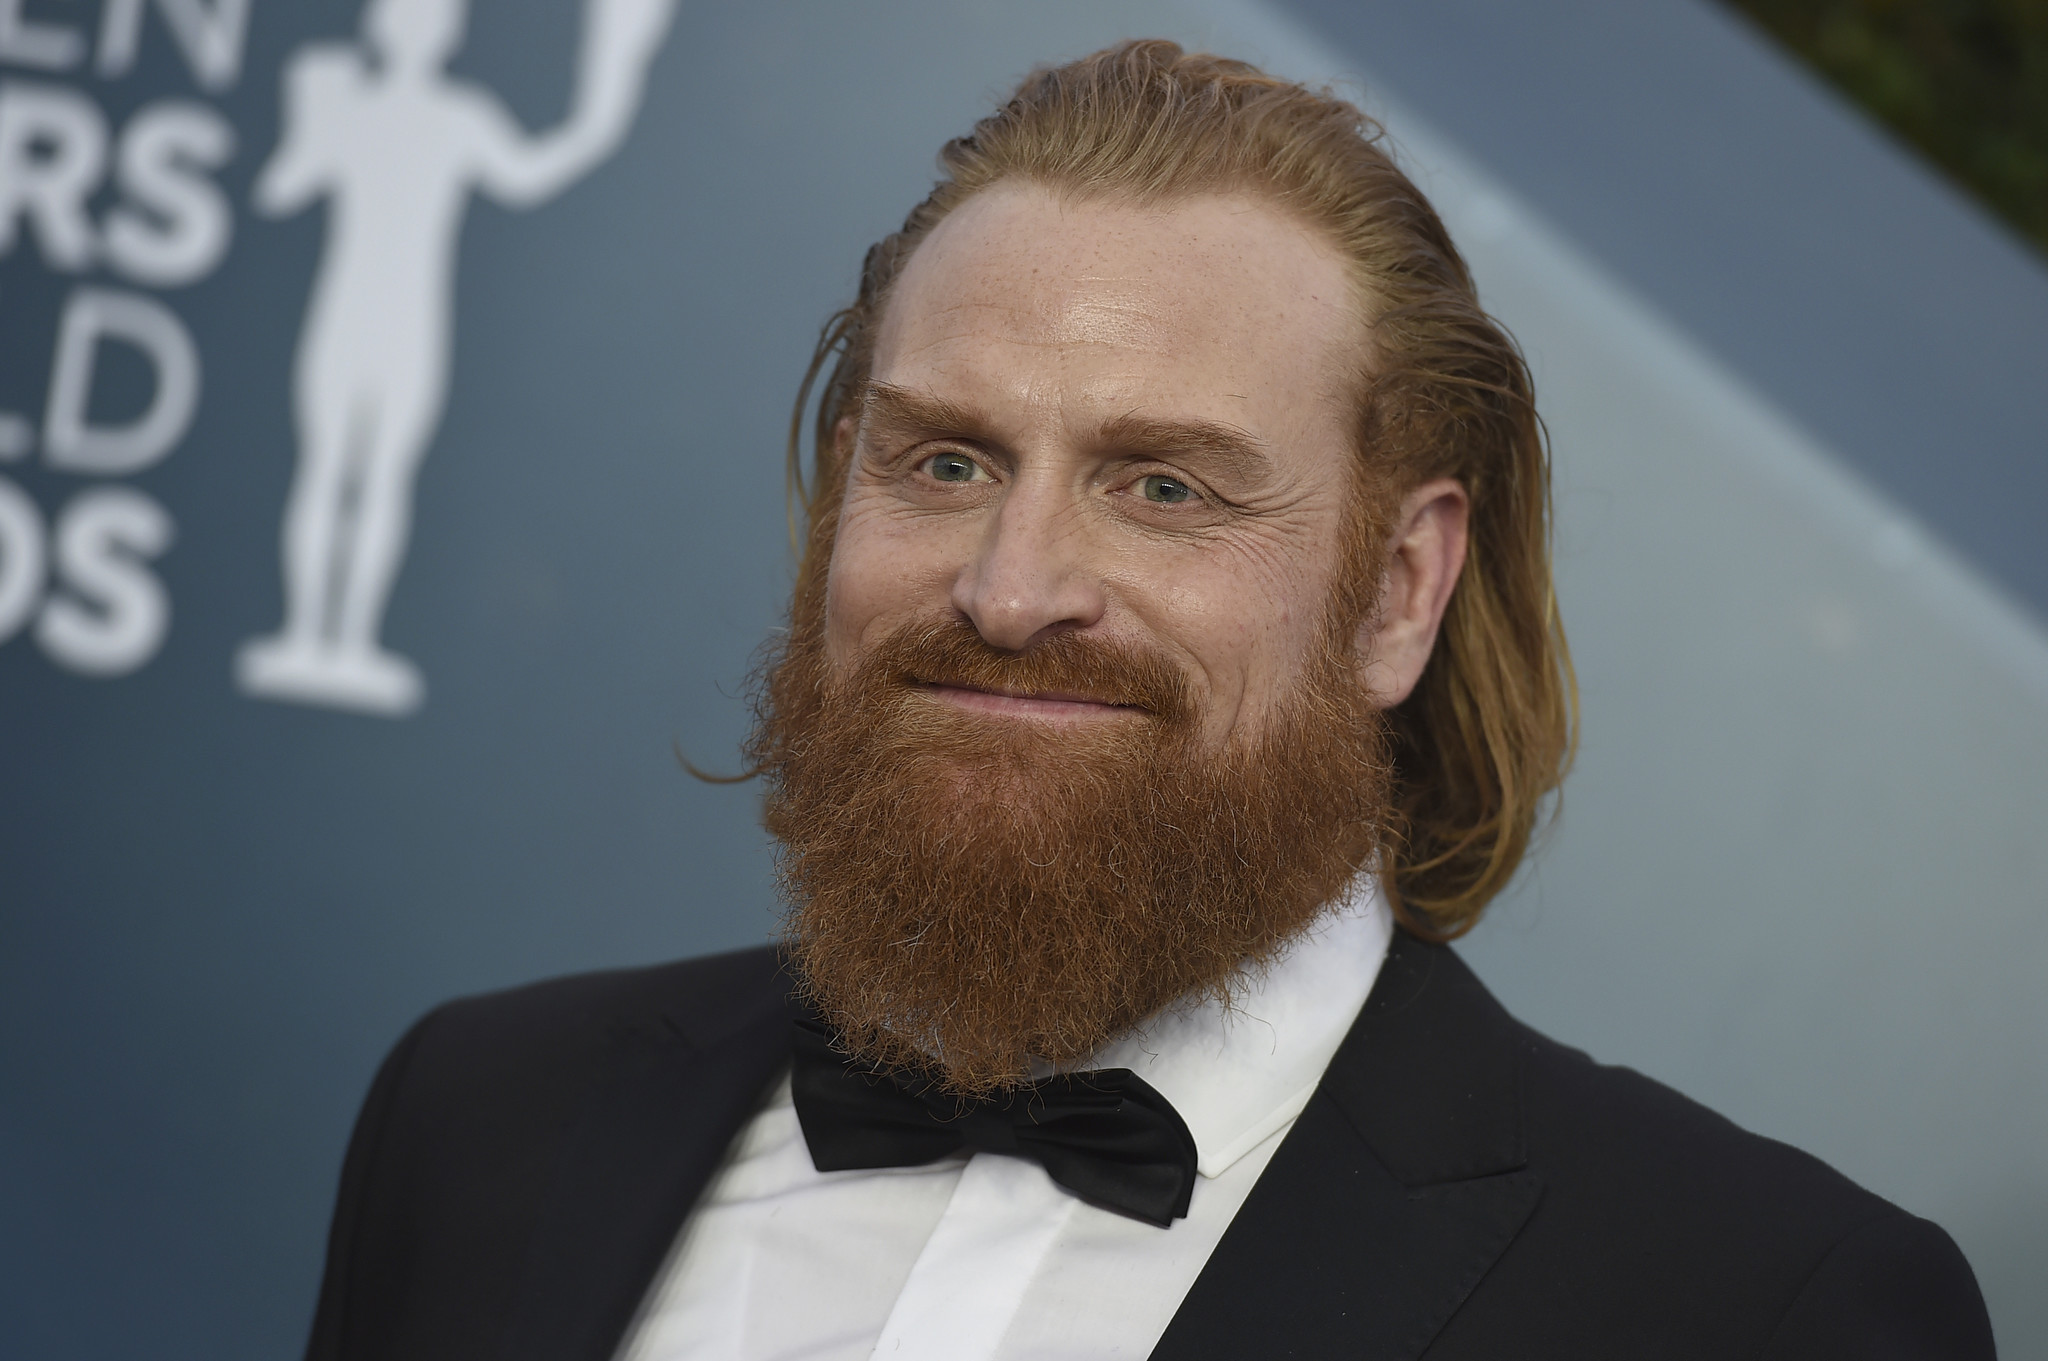 Kristofer Hivju from 'Game of Thrones' has coronavirus